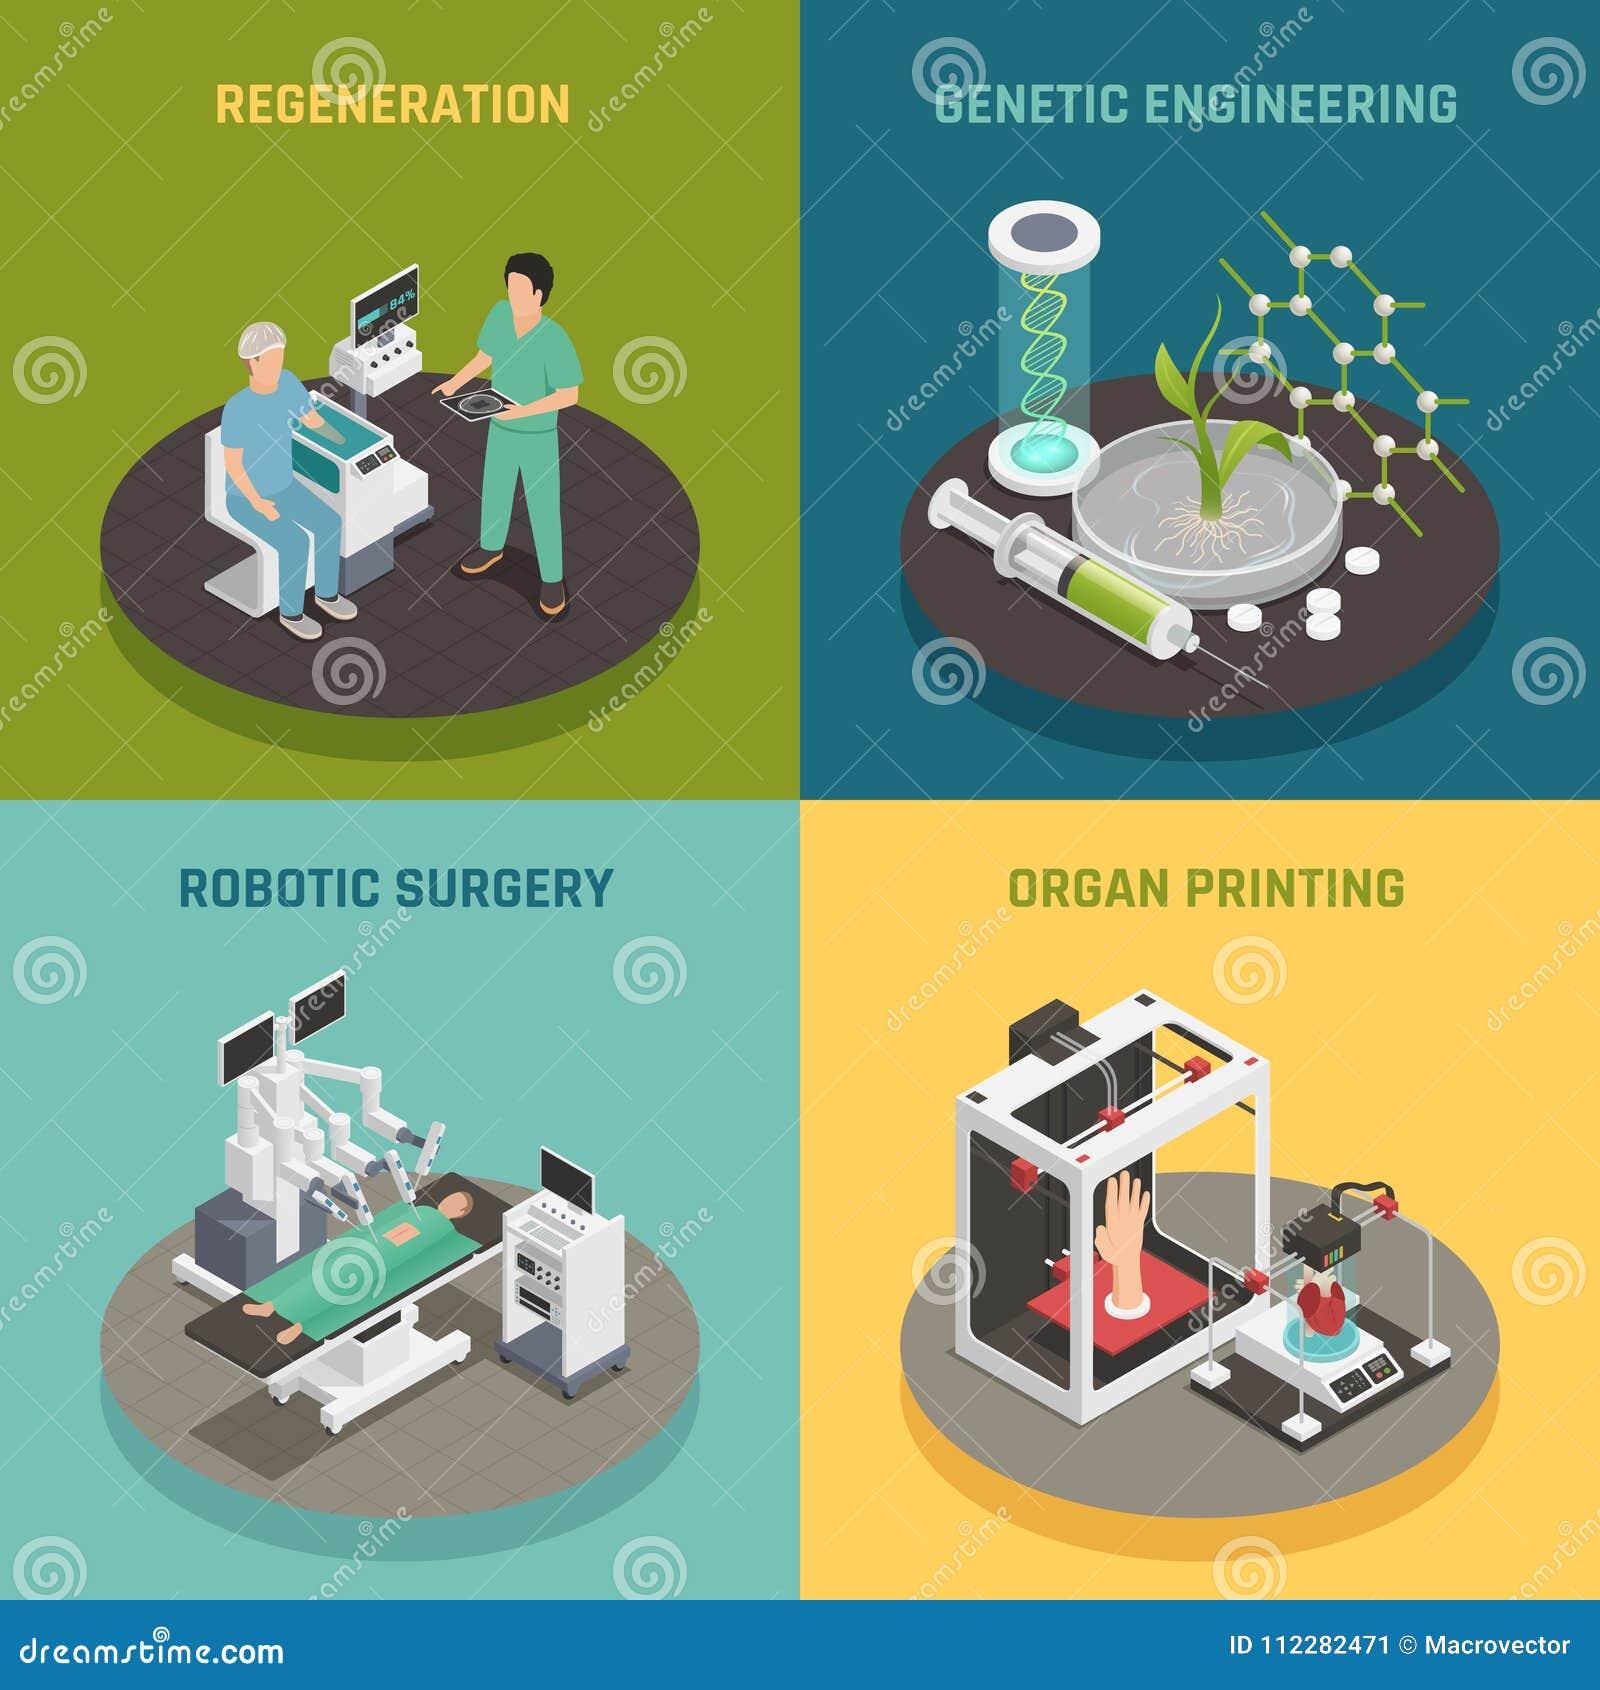 Medicine Future Technology Concept Stock Vector - Illustration of